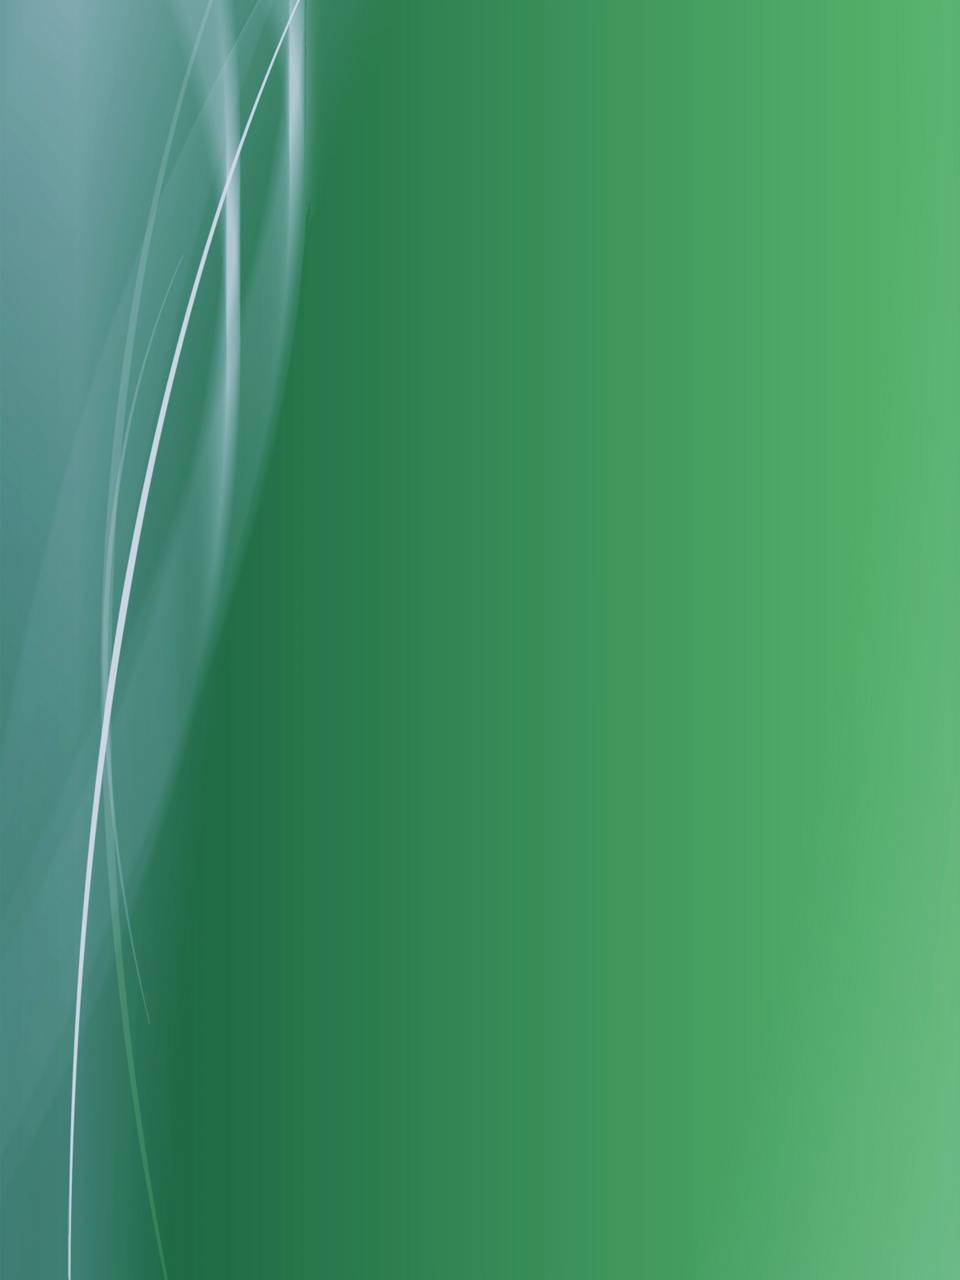 digital-green-hd